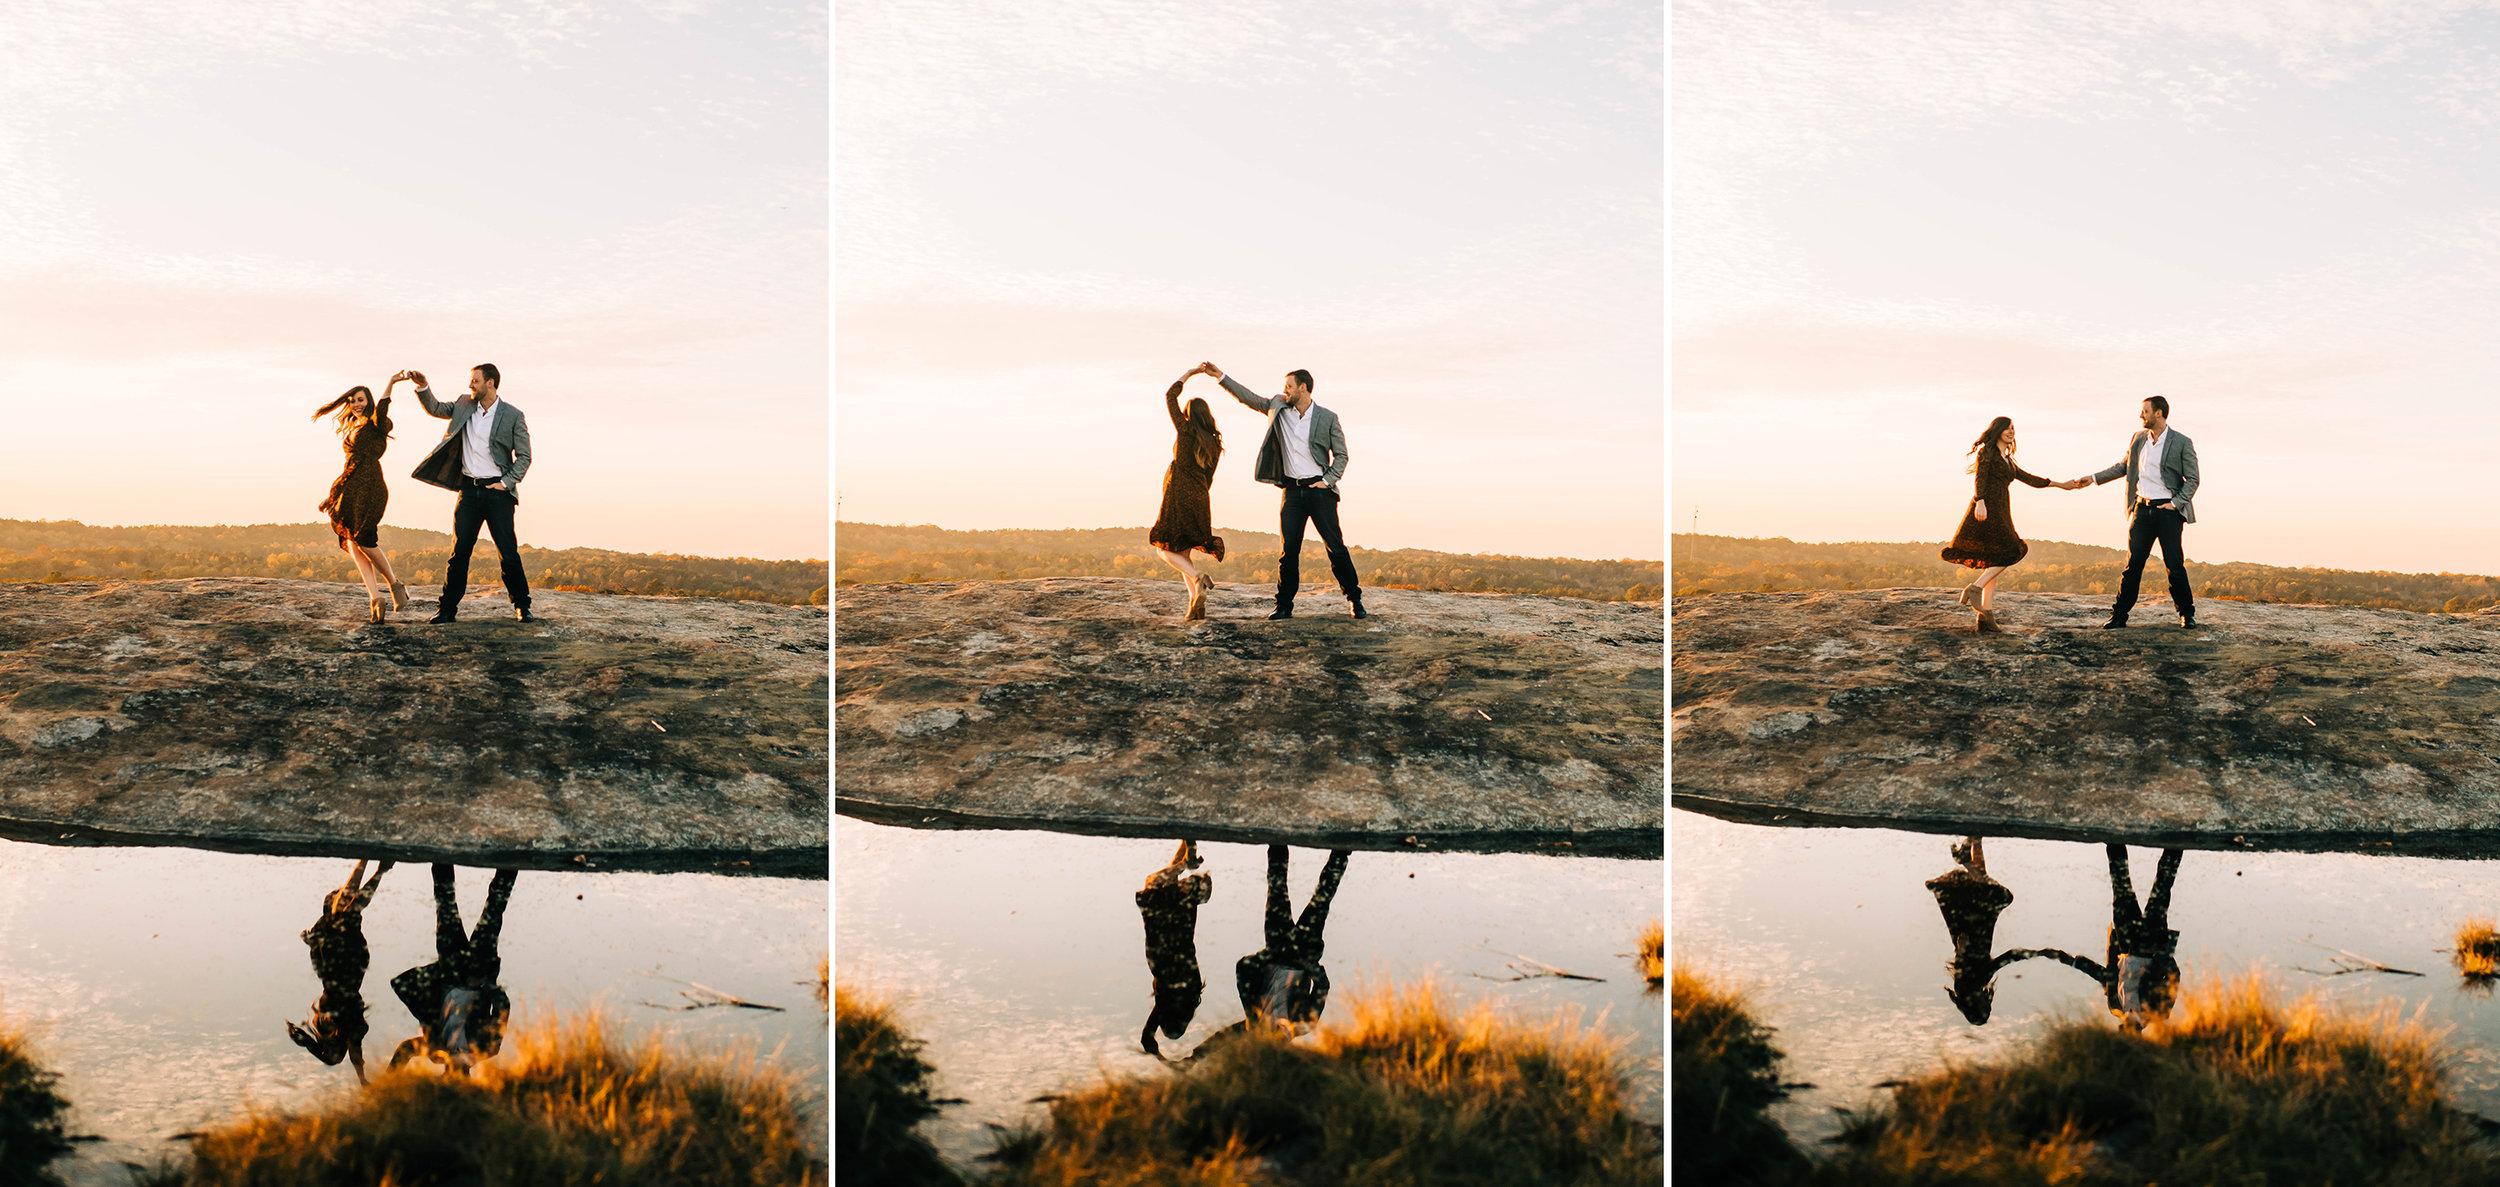 san francisco oakland bay area california sf yosemite big sur atlanta georgia majestic diner ponce eastside beltline jackson street bridge atlanta skyline weloveatl engagement nontraditional wedding photographer -183.jpg